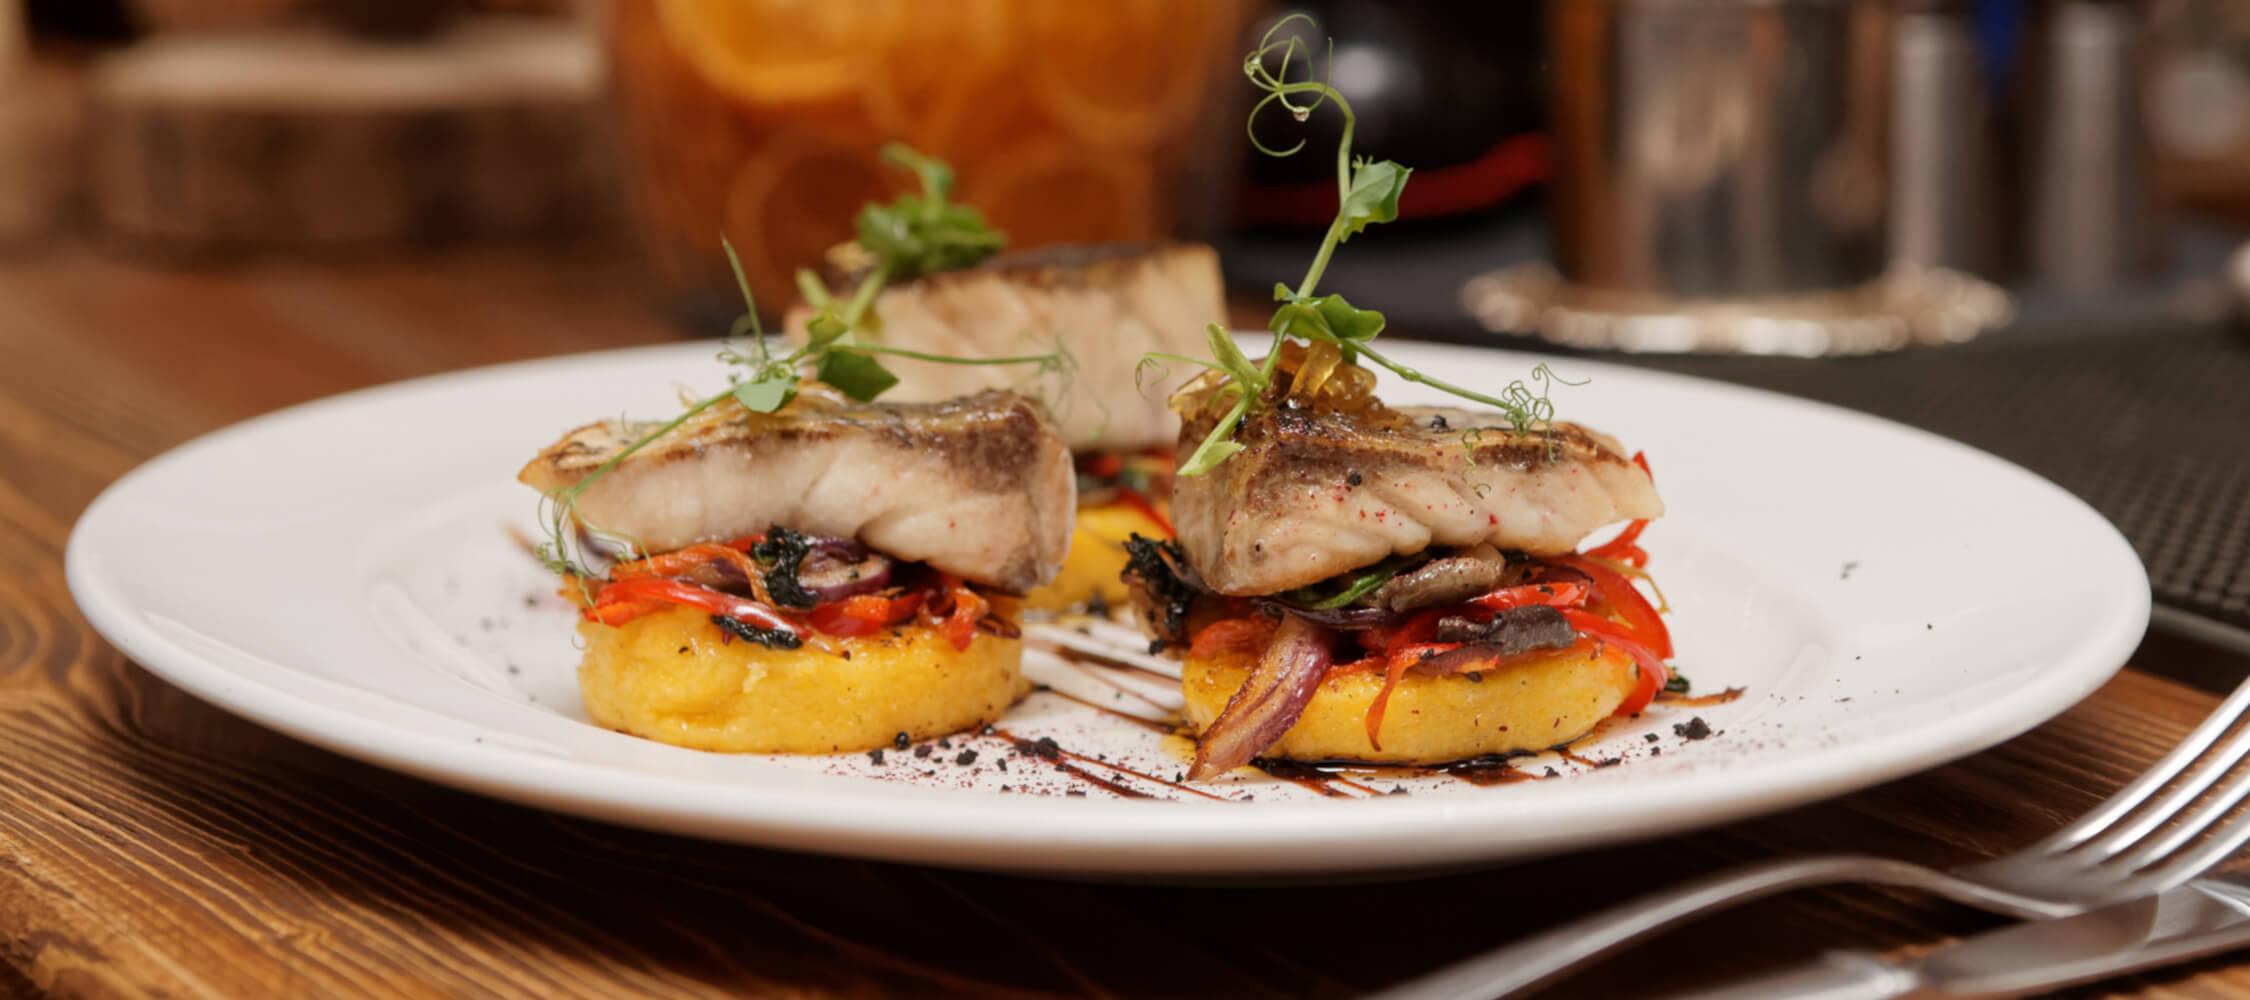 City_Hotel_Merano_Restaurant_City_Dinner_Main_Fisch_183999934_2250x1000